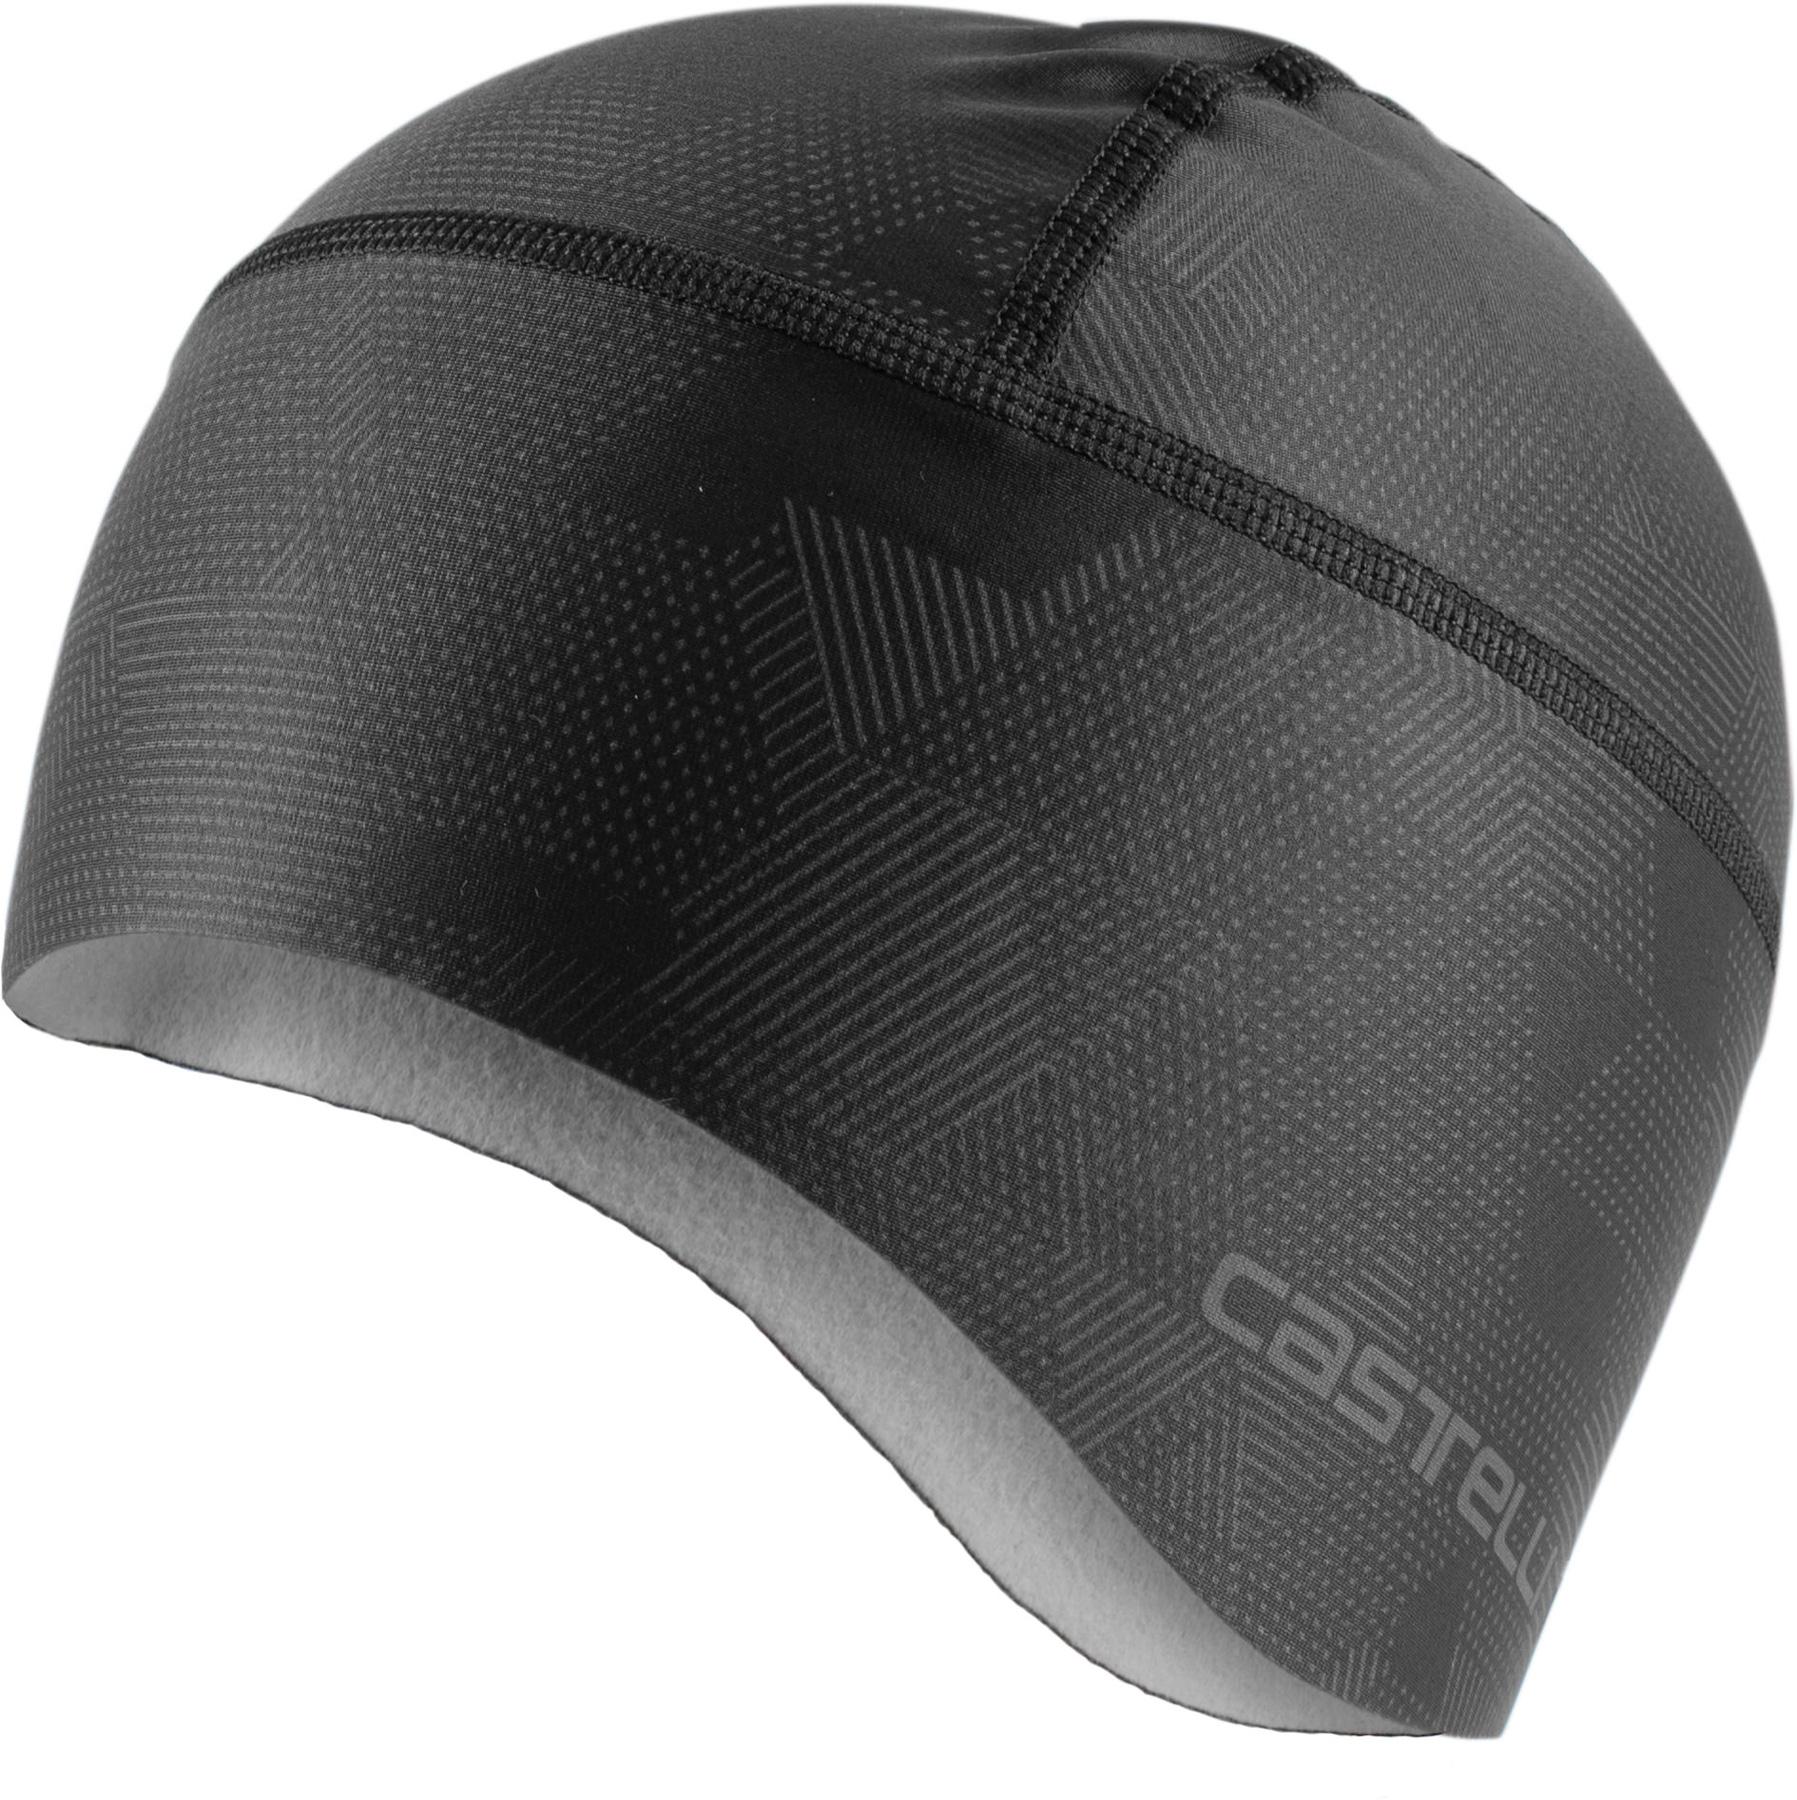 Produktbild von Castelli Pro Thermal Skully Unterhelm - light black 085